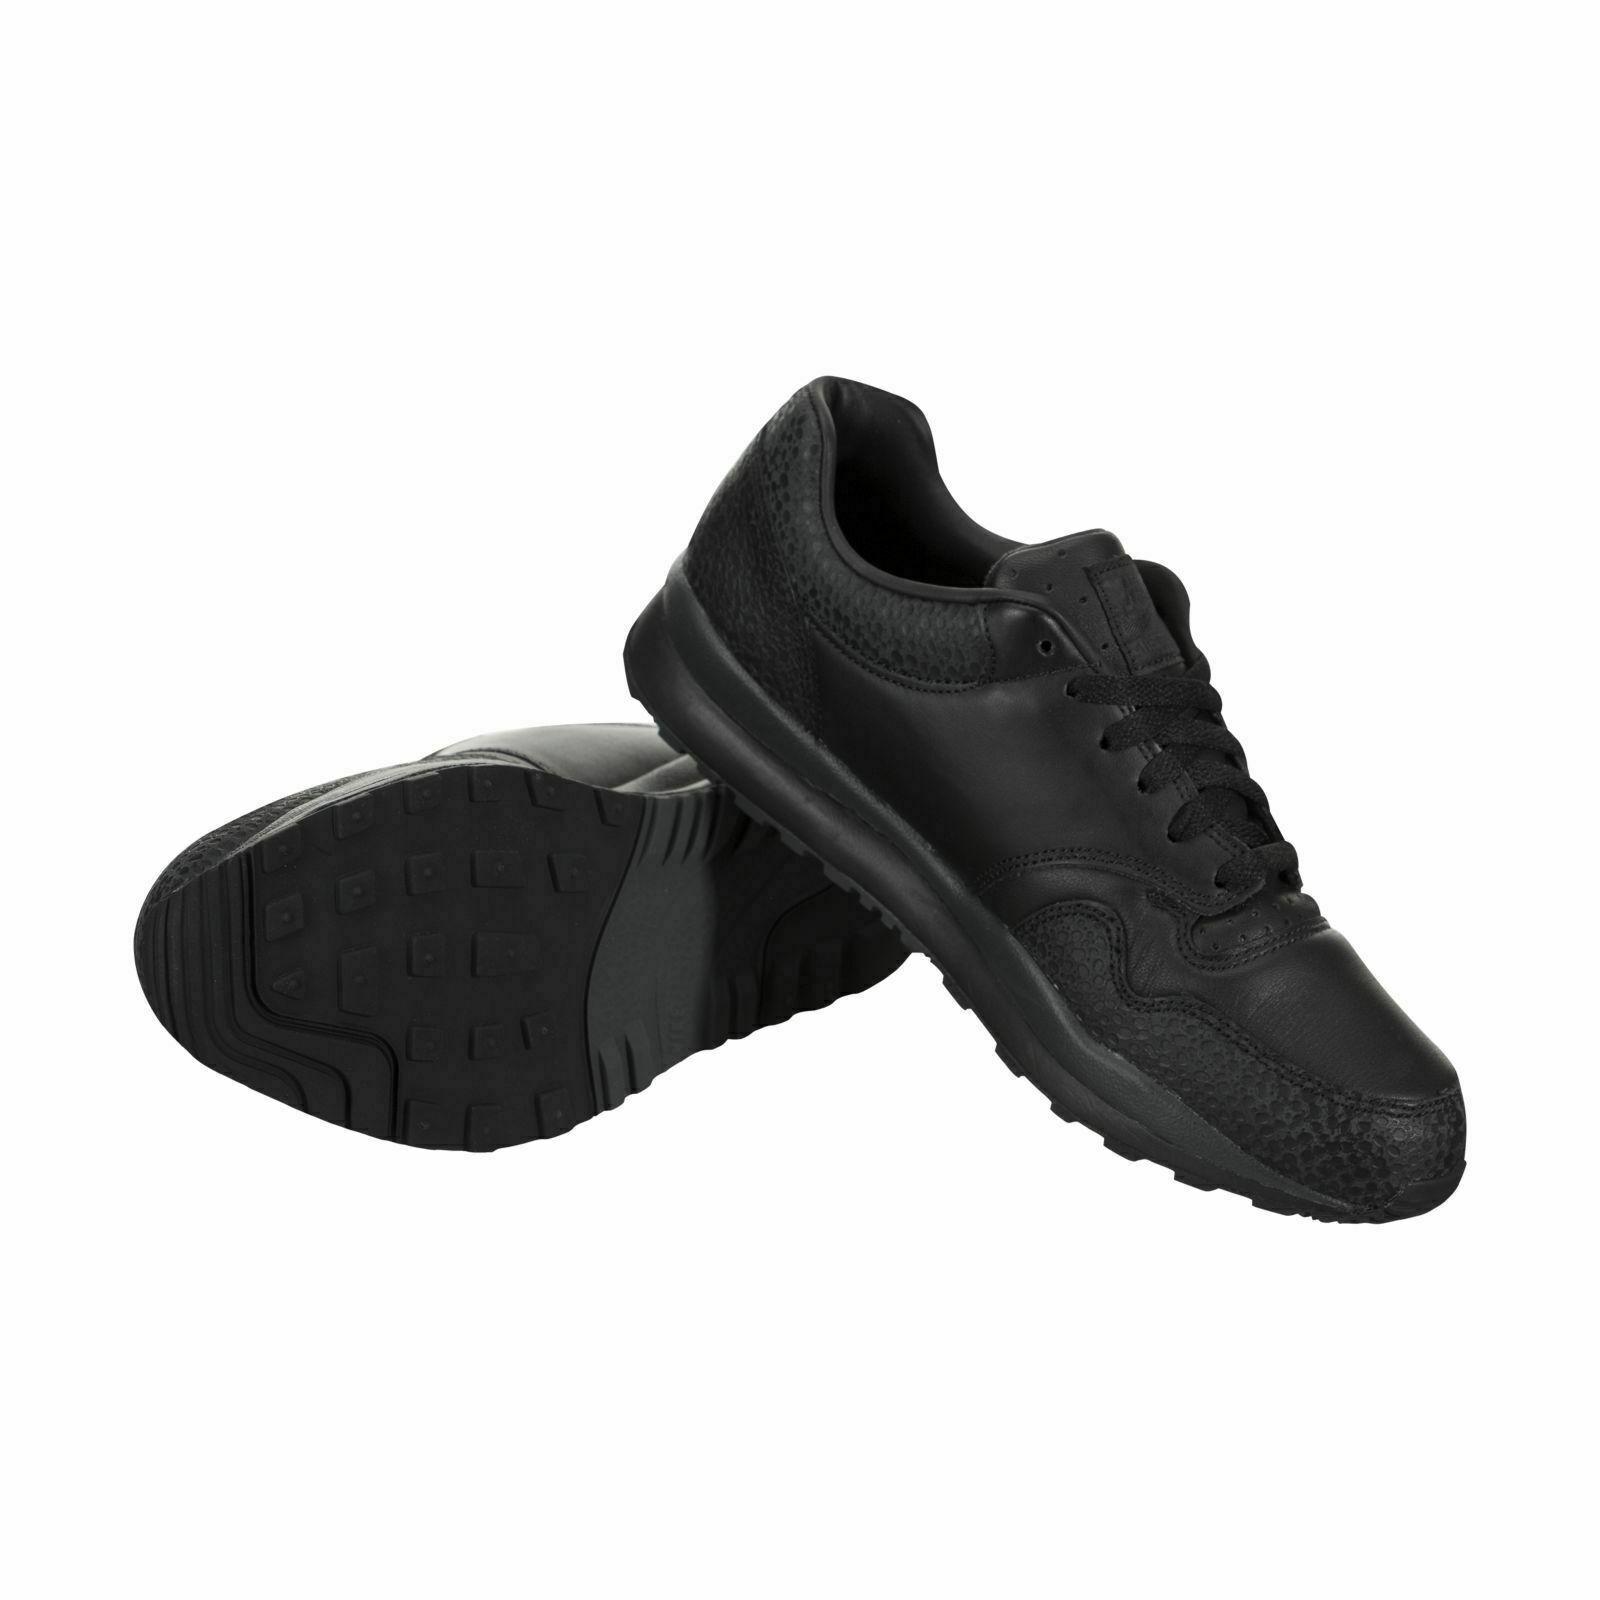 MEN'S NIKE AIR SAFARI QS SHOES black anthracite AO3295 002 MSRP $140